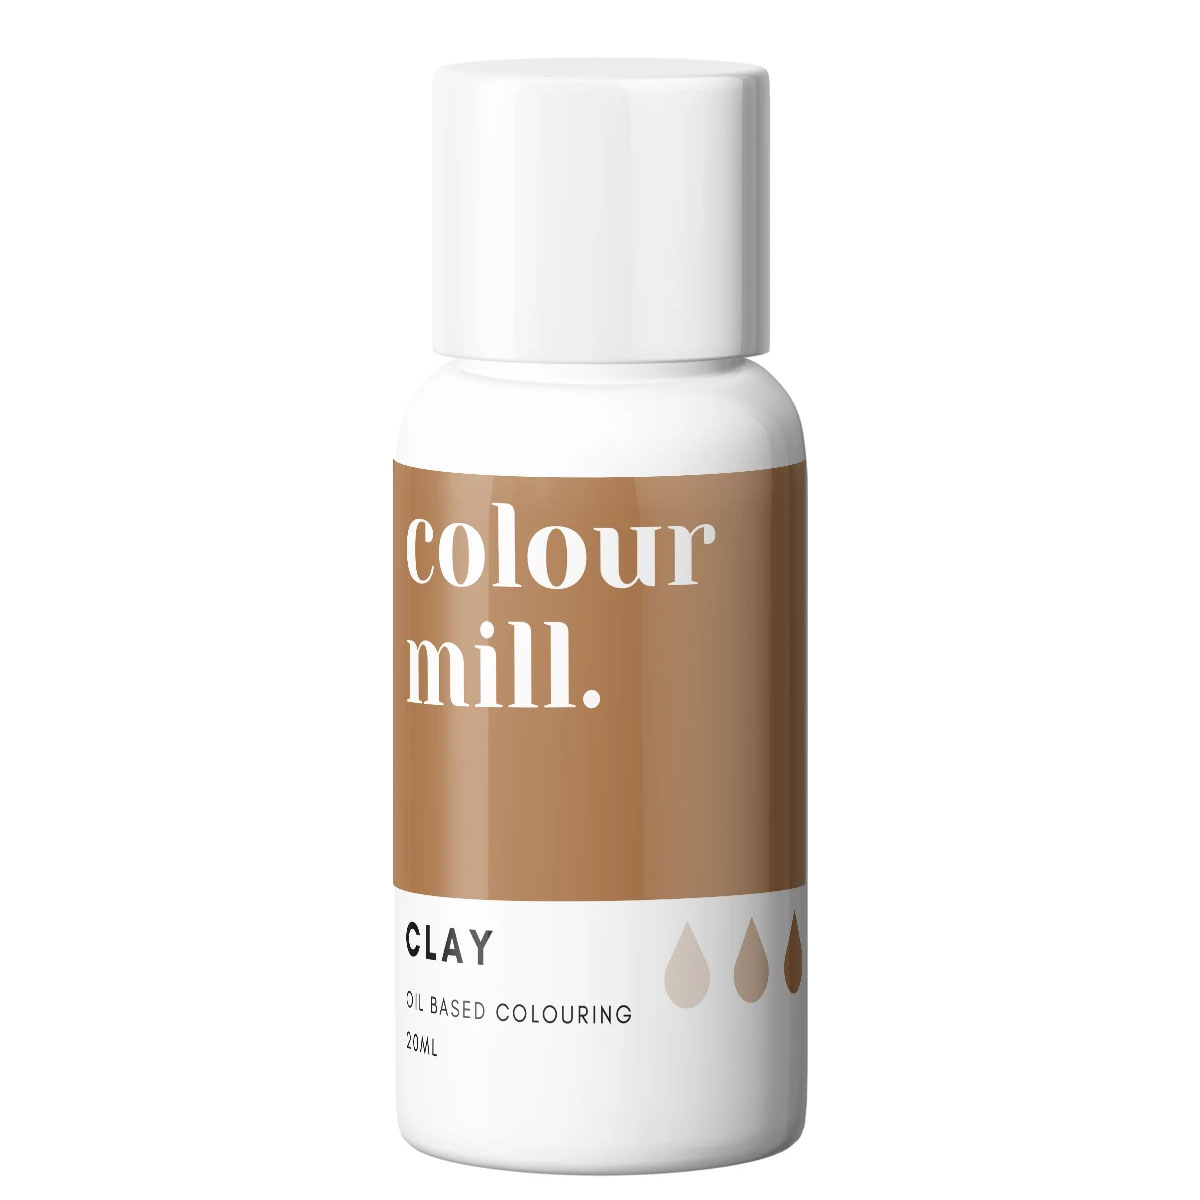 Colour Mill fettlösliche Lebensmittelfarbe - Clay 20ml